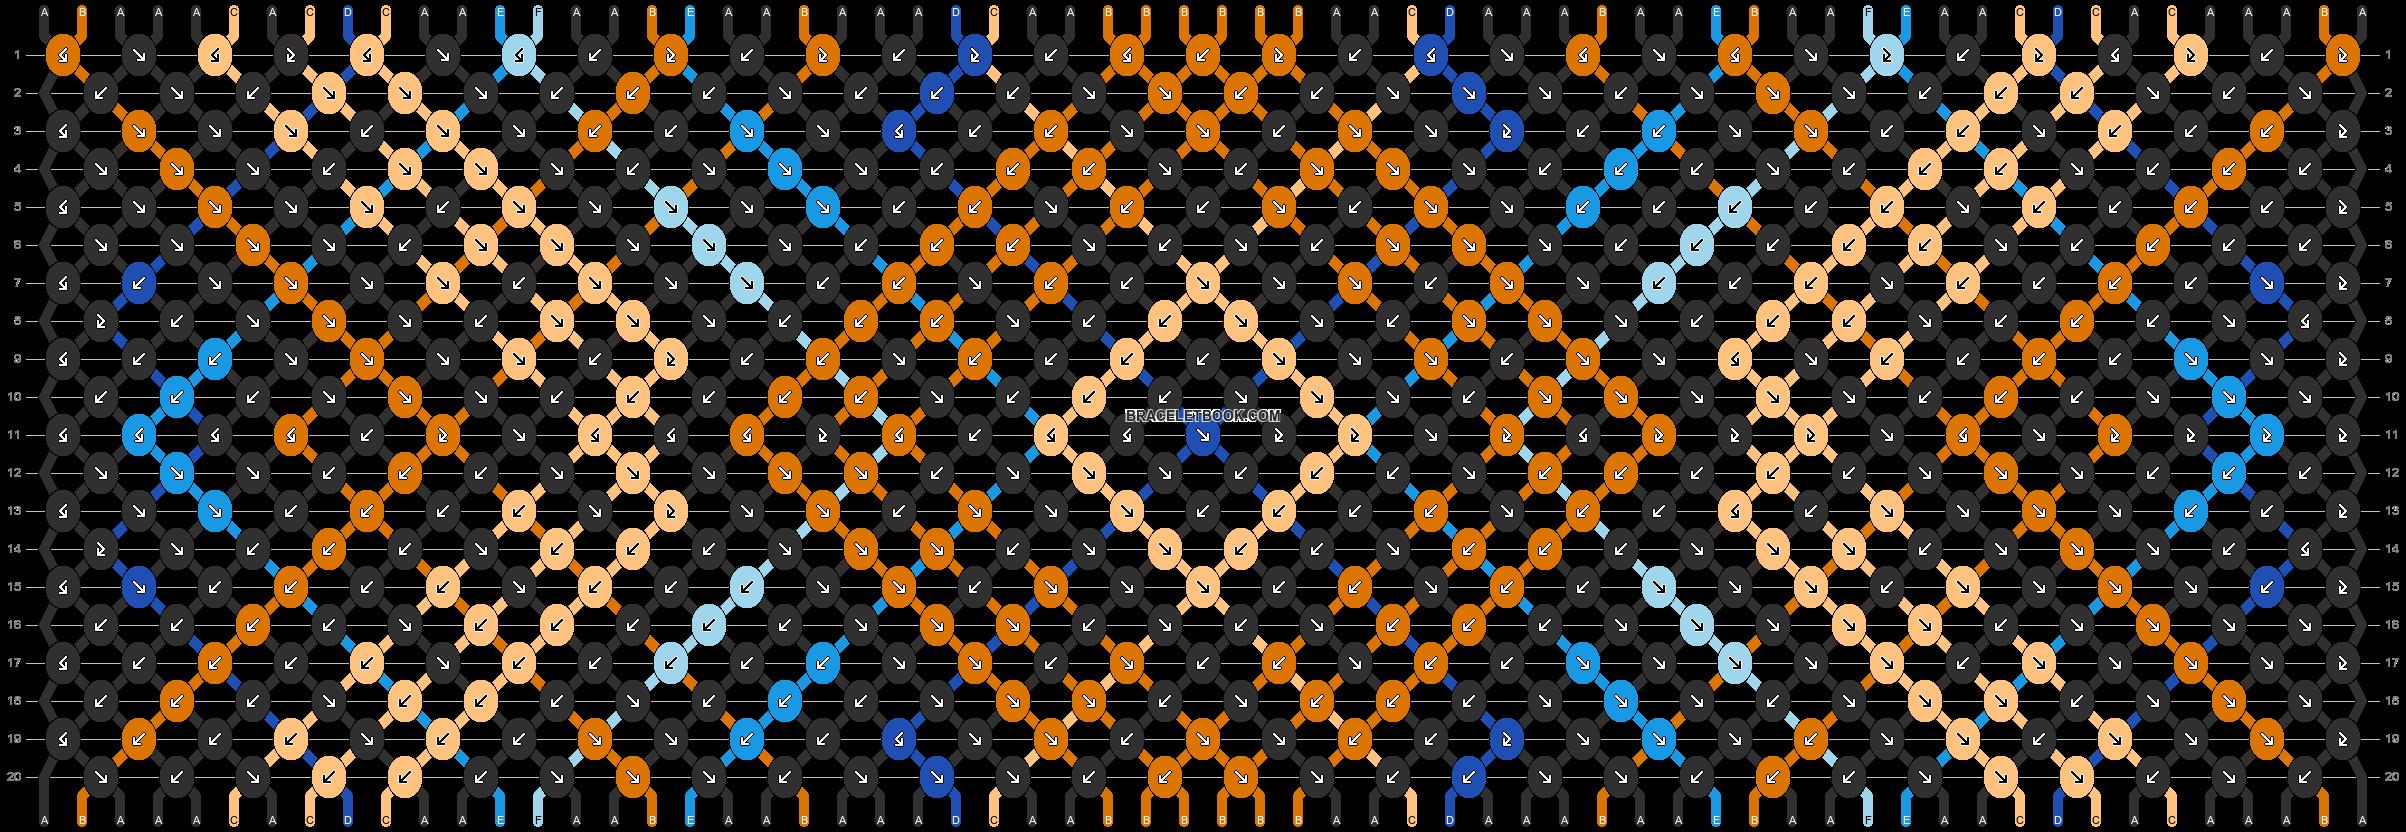 Normal pattern #77005 pattern